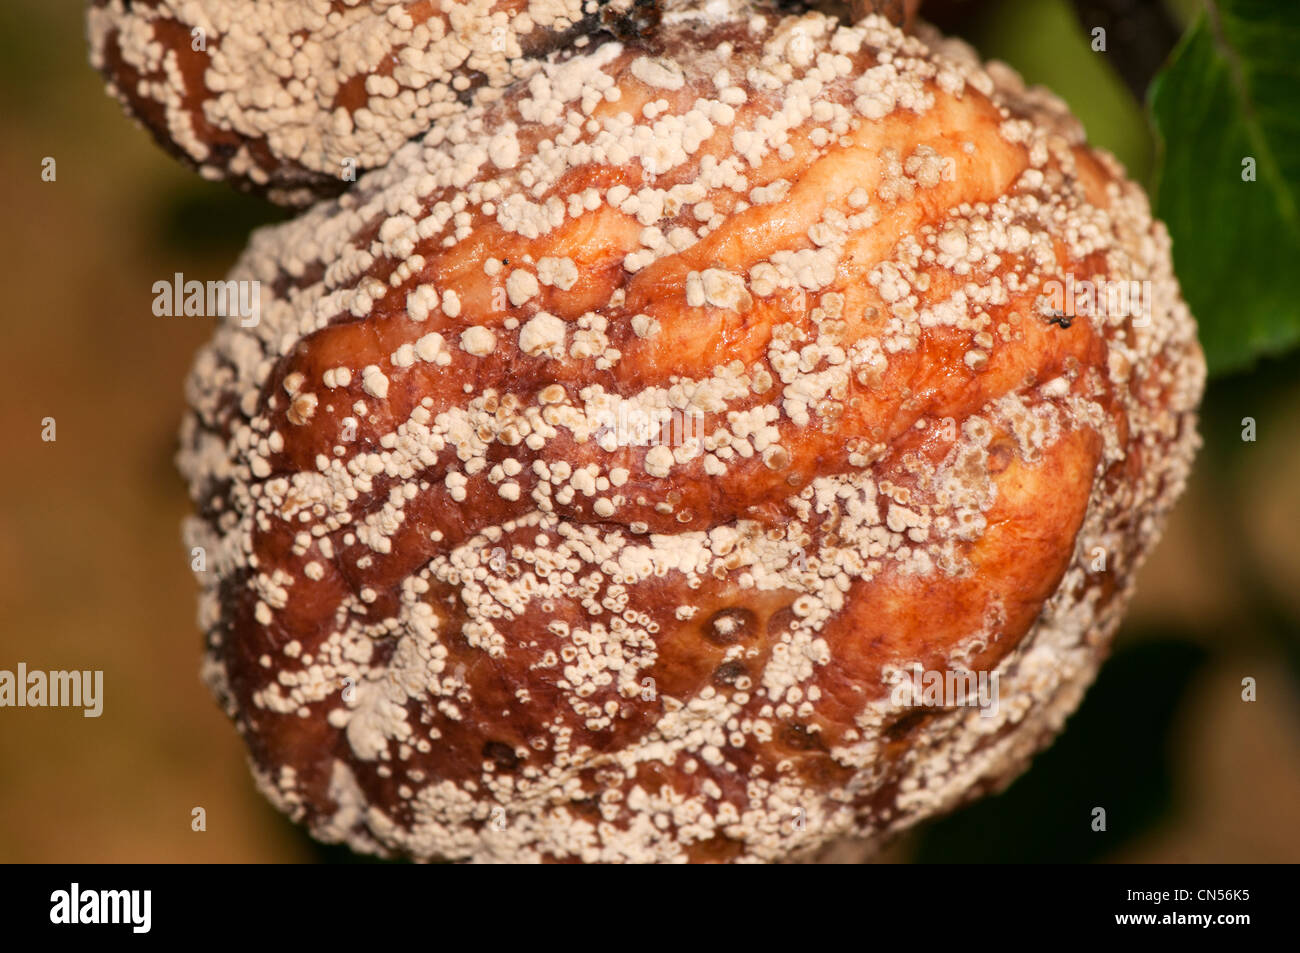 monilia fructigena, brown fruit rot, on apple - Stock Image